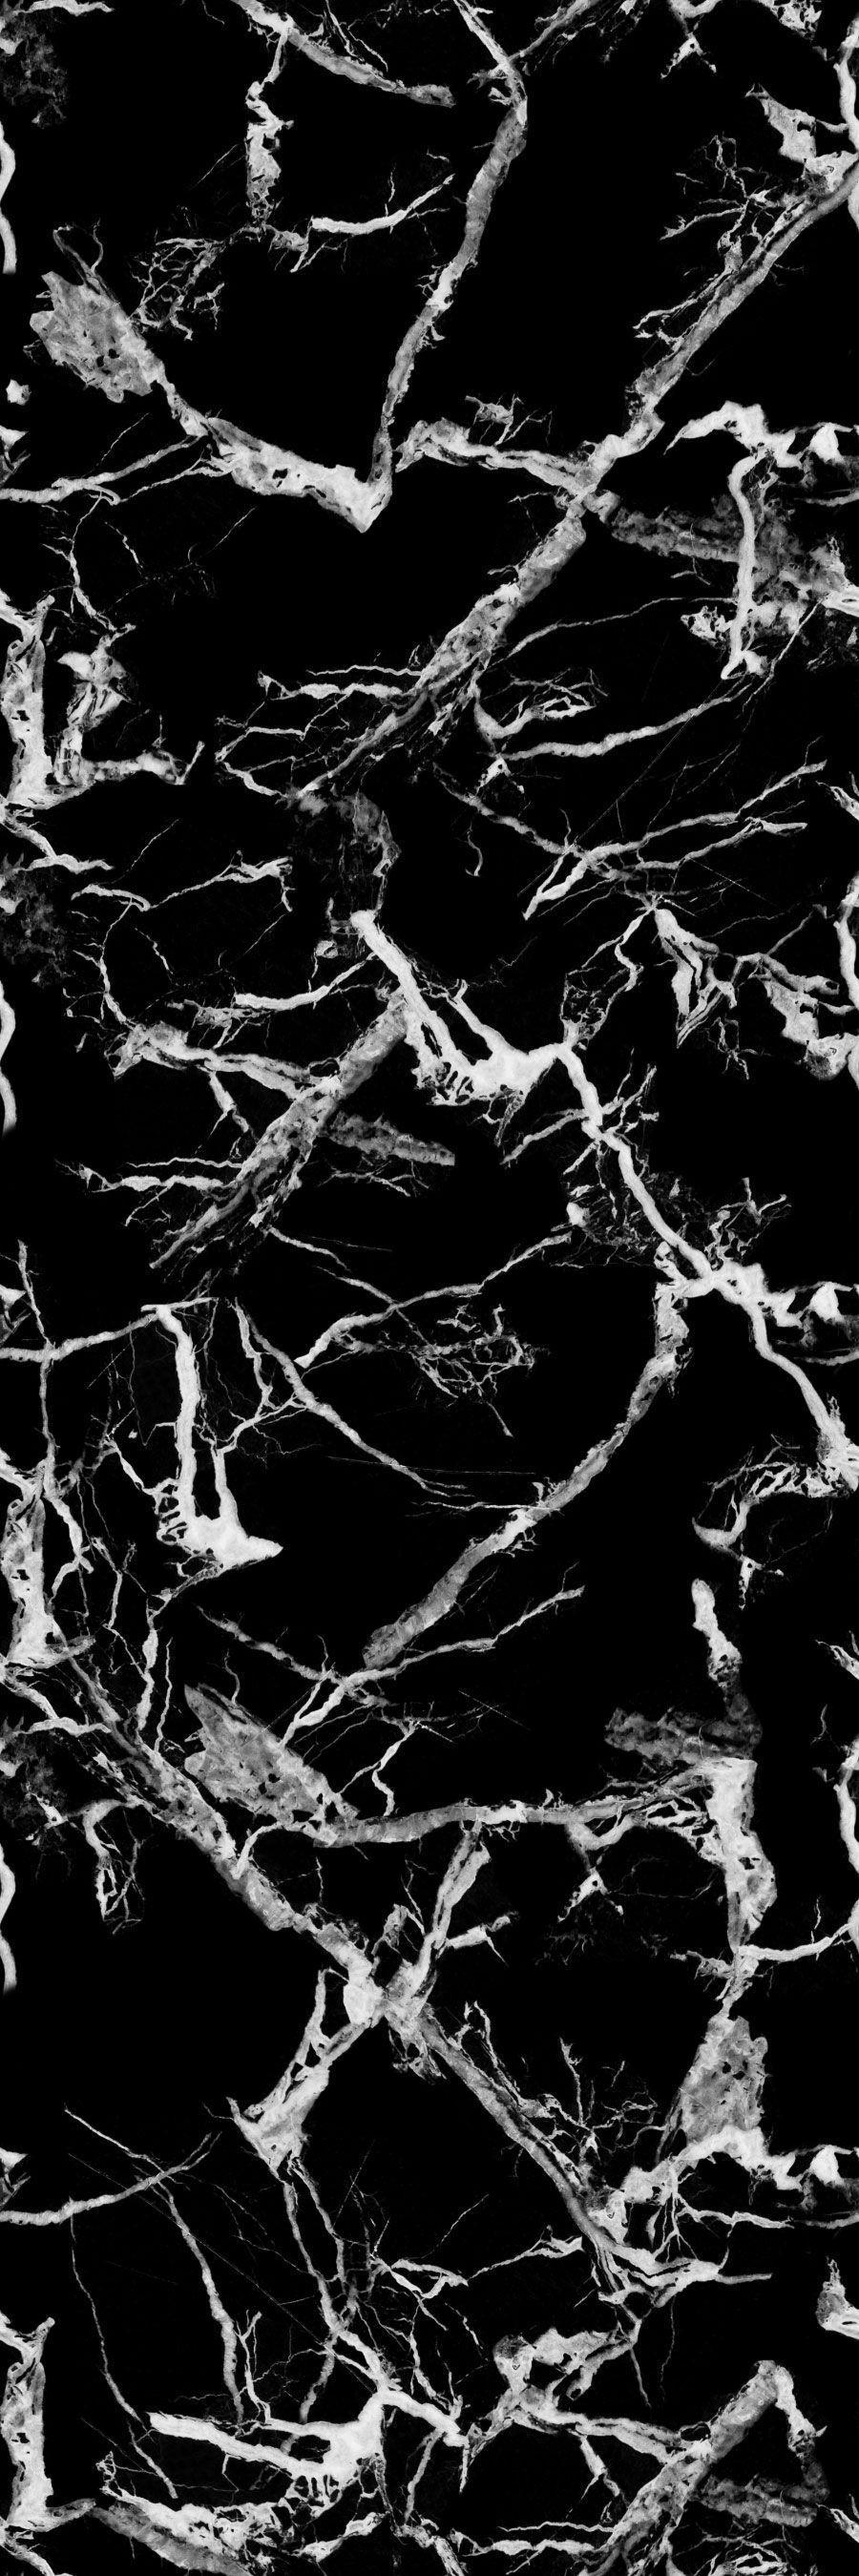 Black Marble Iphone Wallpapers Top Free Black Marble Iphone Backgrounds Wallpaperaccess